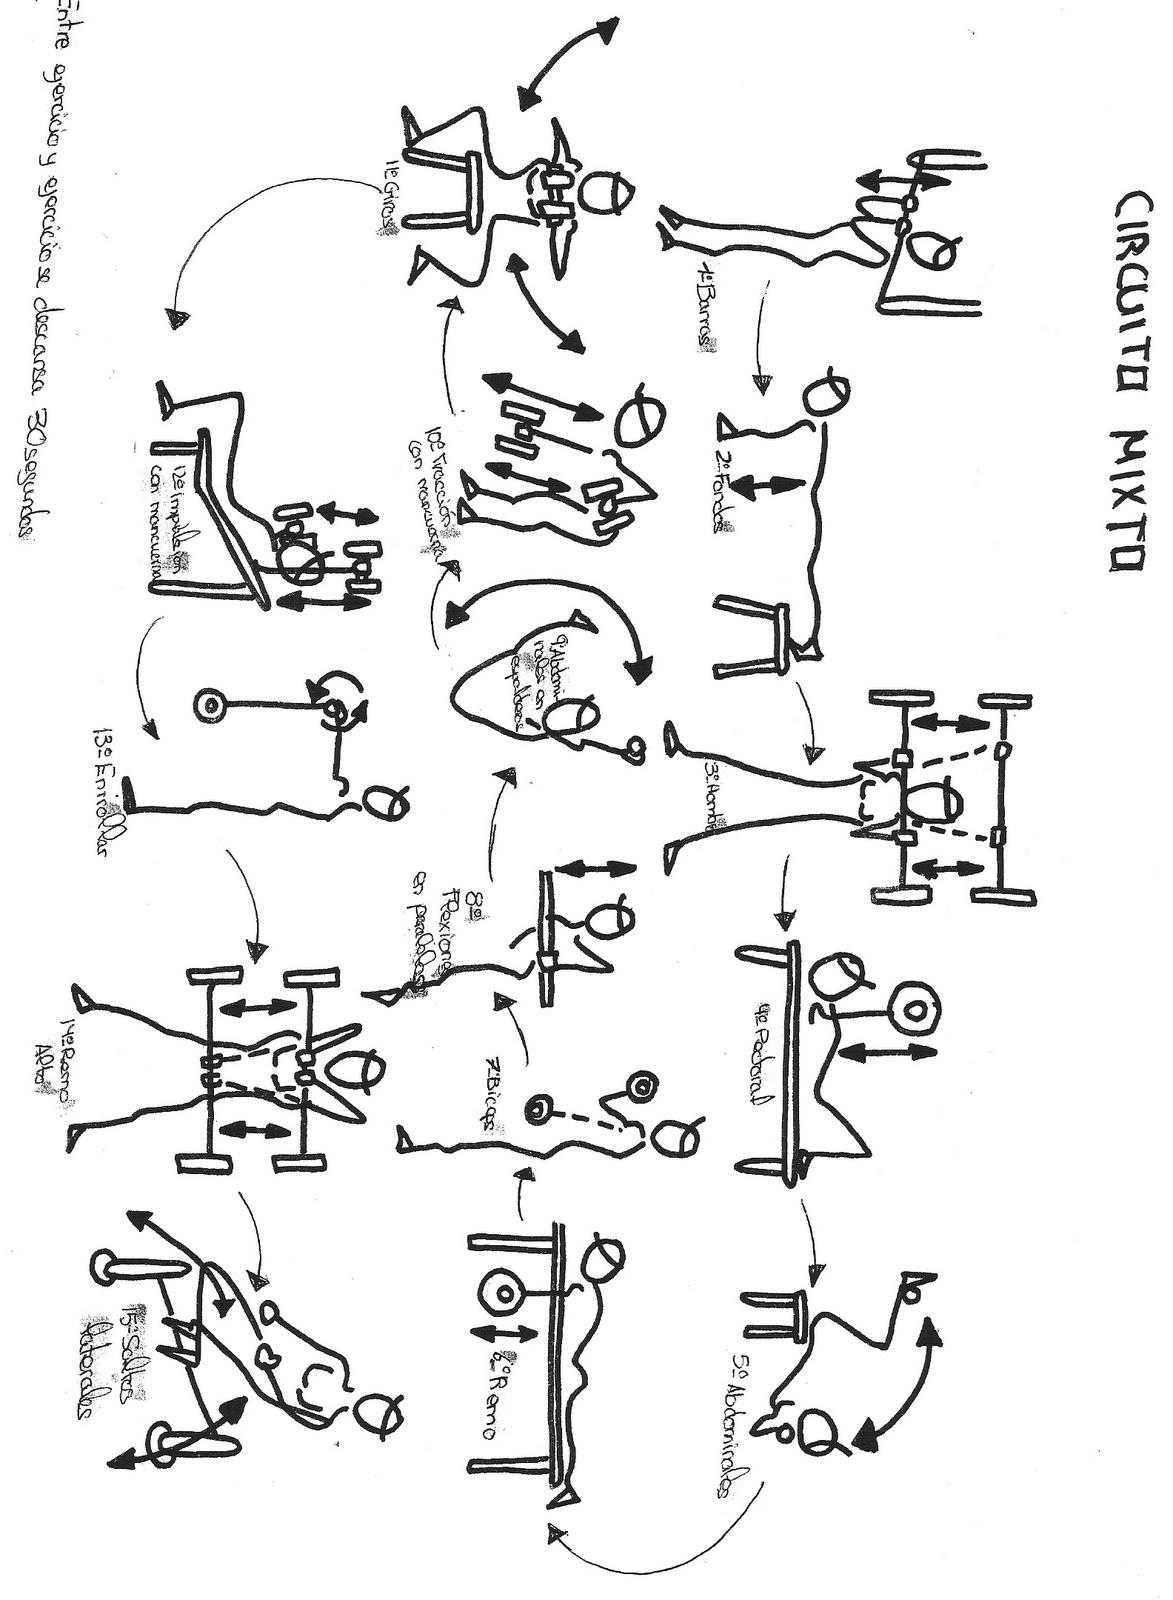 Tipos de saltos en cuerda buscar con google exercicis - Tipos de cuerdas ...